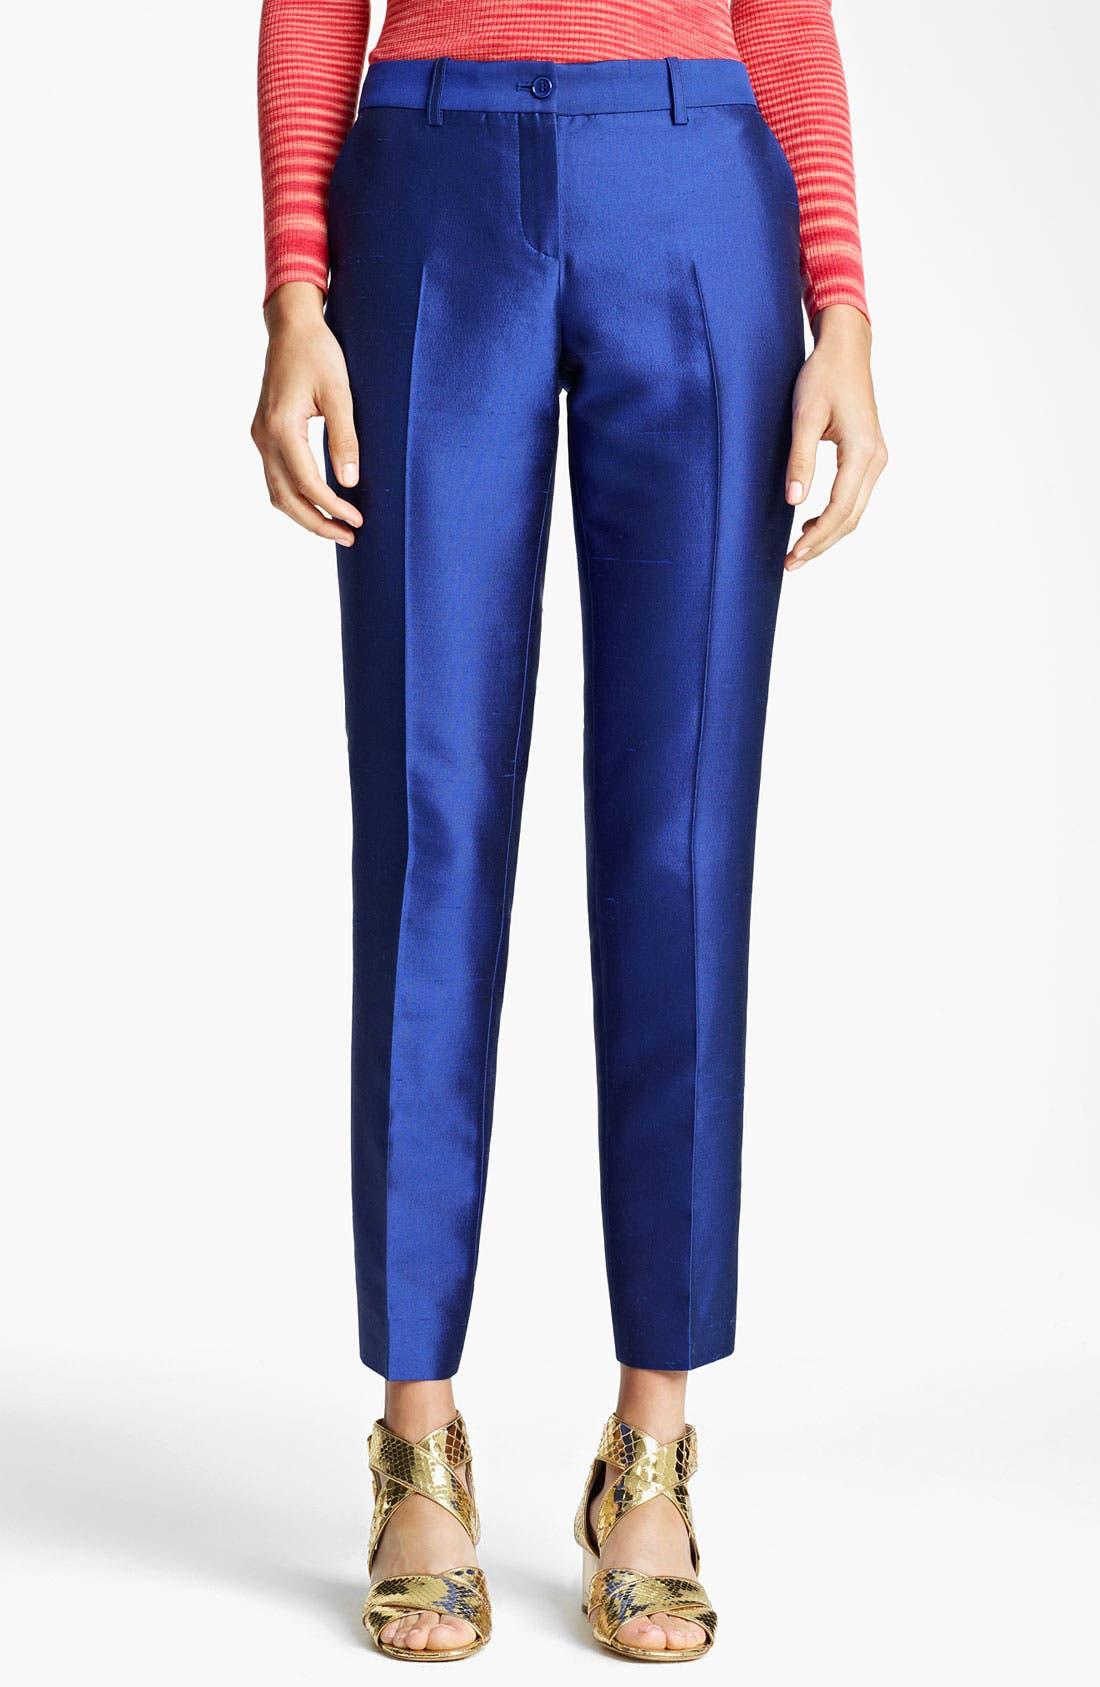 Main Image - Michael Kors Shantung Pants